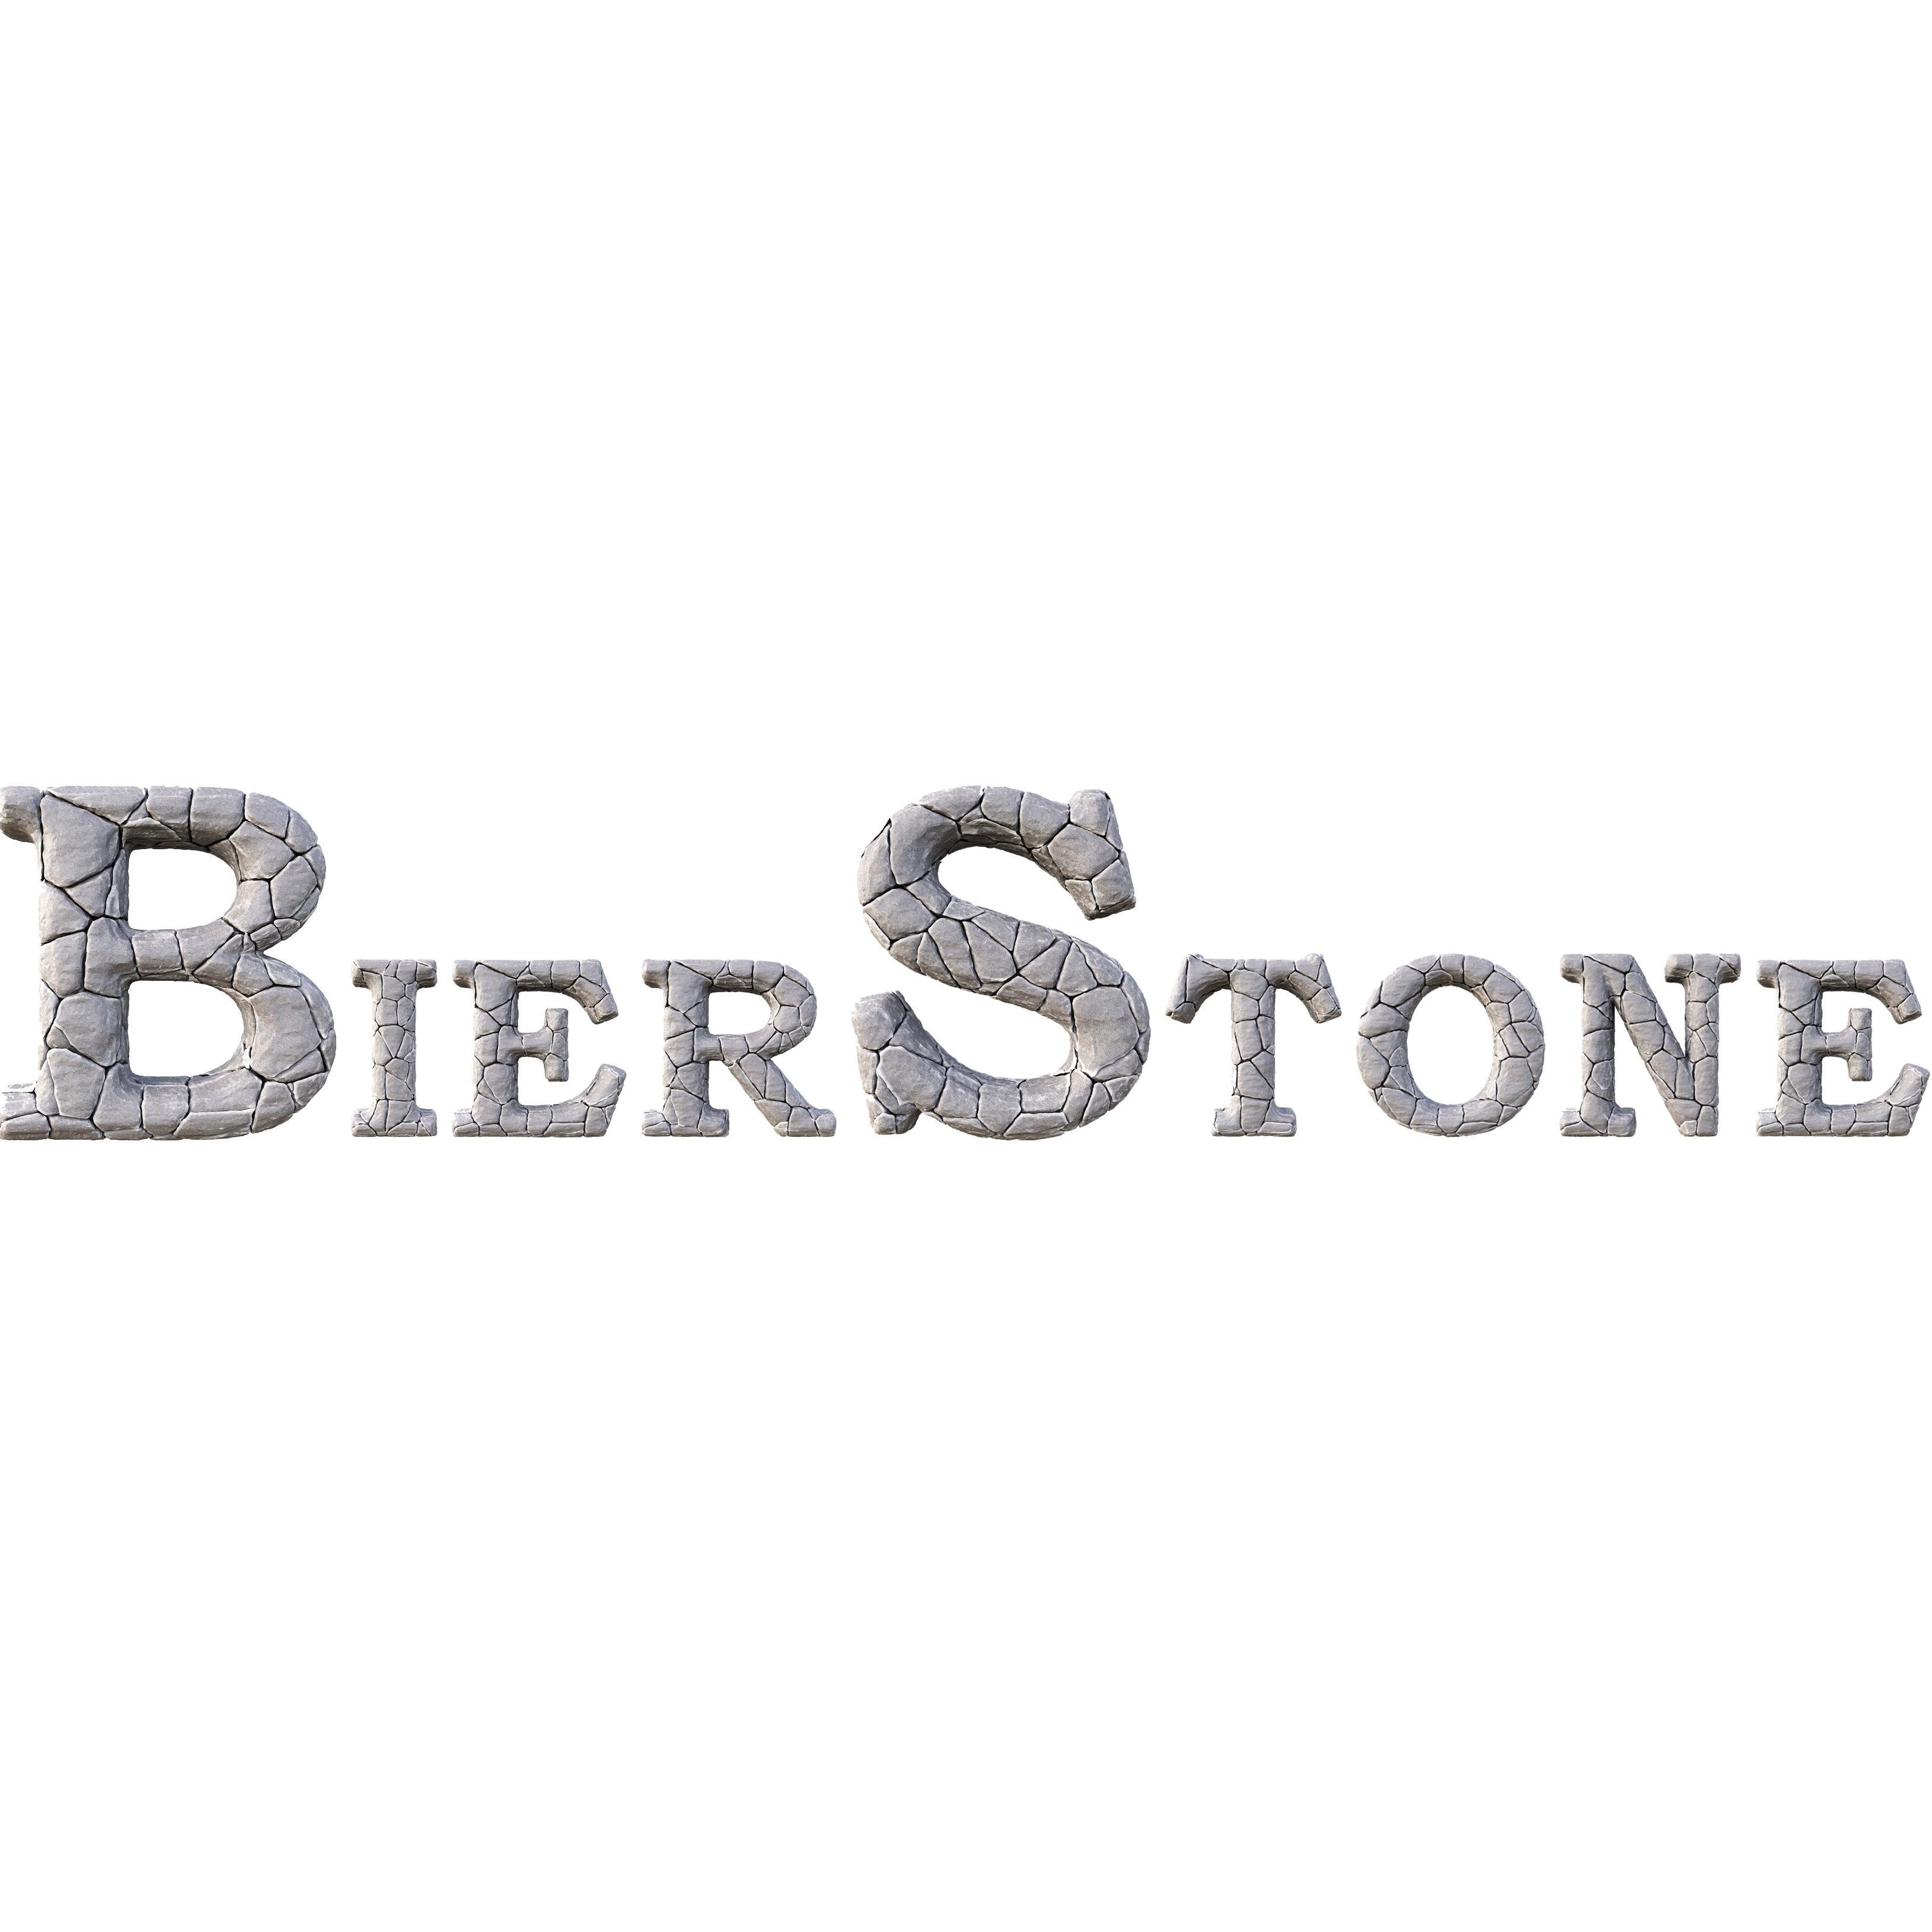 BierStone LLC Photo